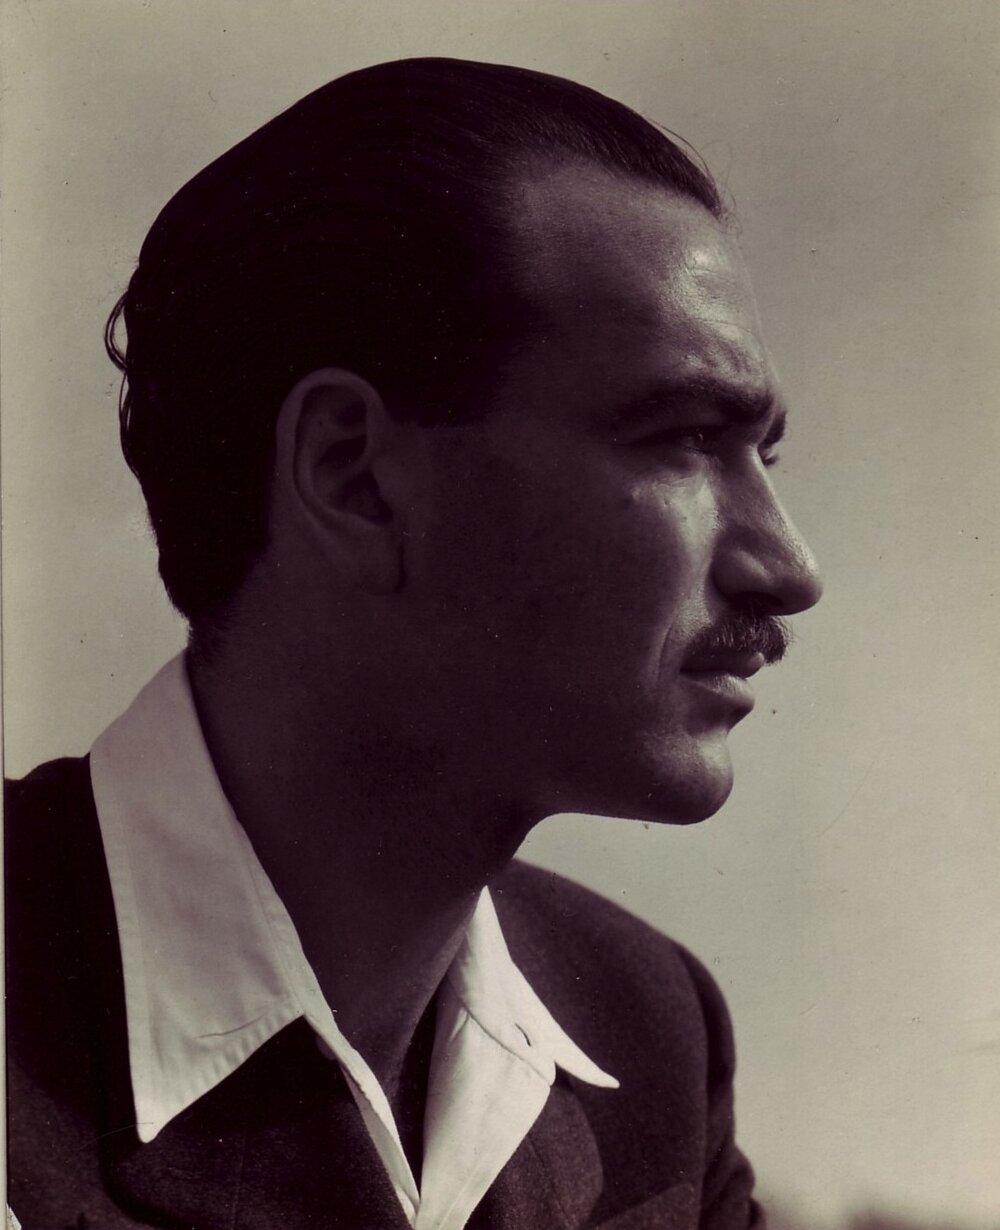 Edward Biberman by Edward Weston.jpg